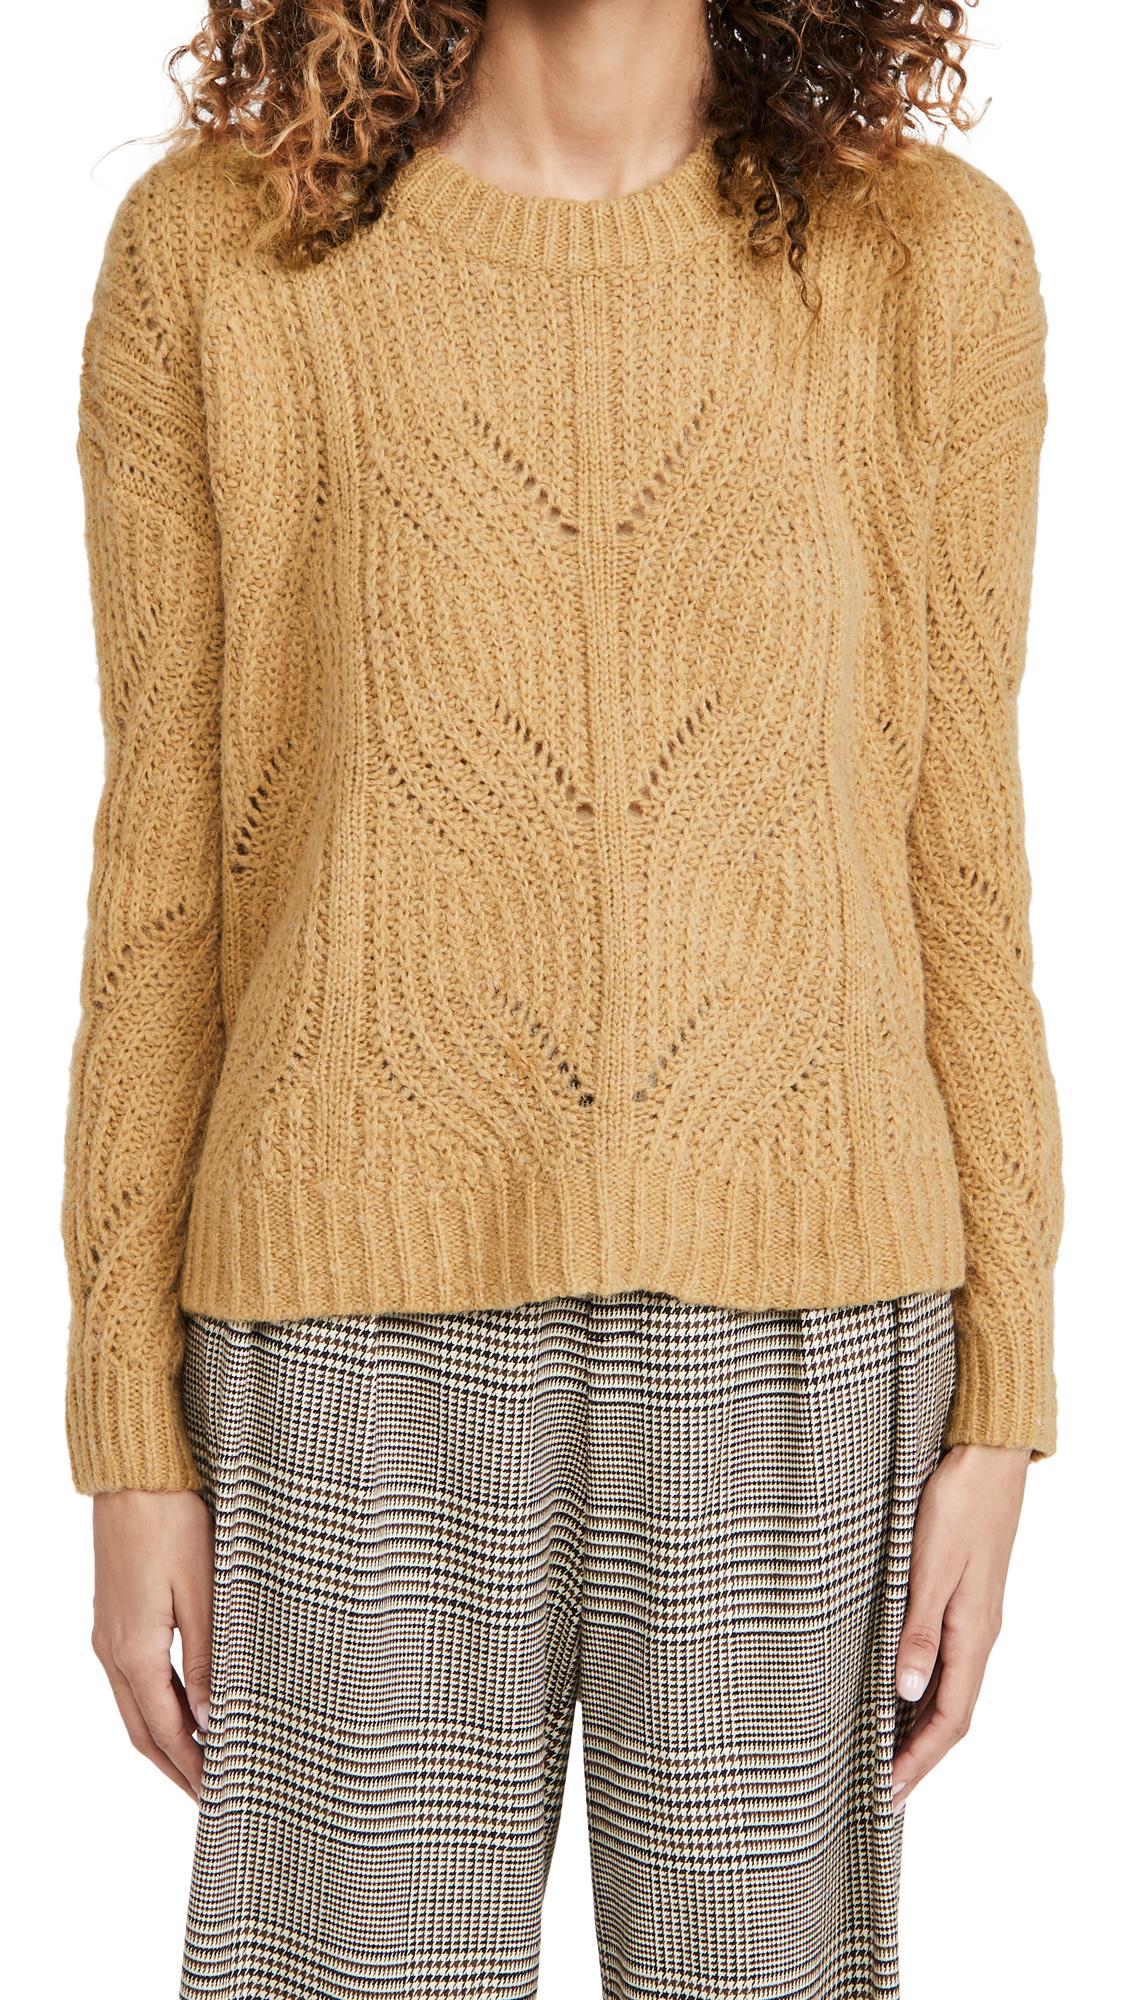 Madewell Dasher Stich Crew Sweater